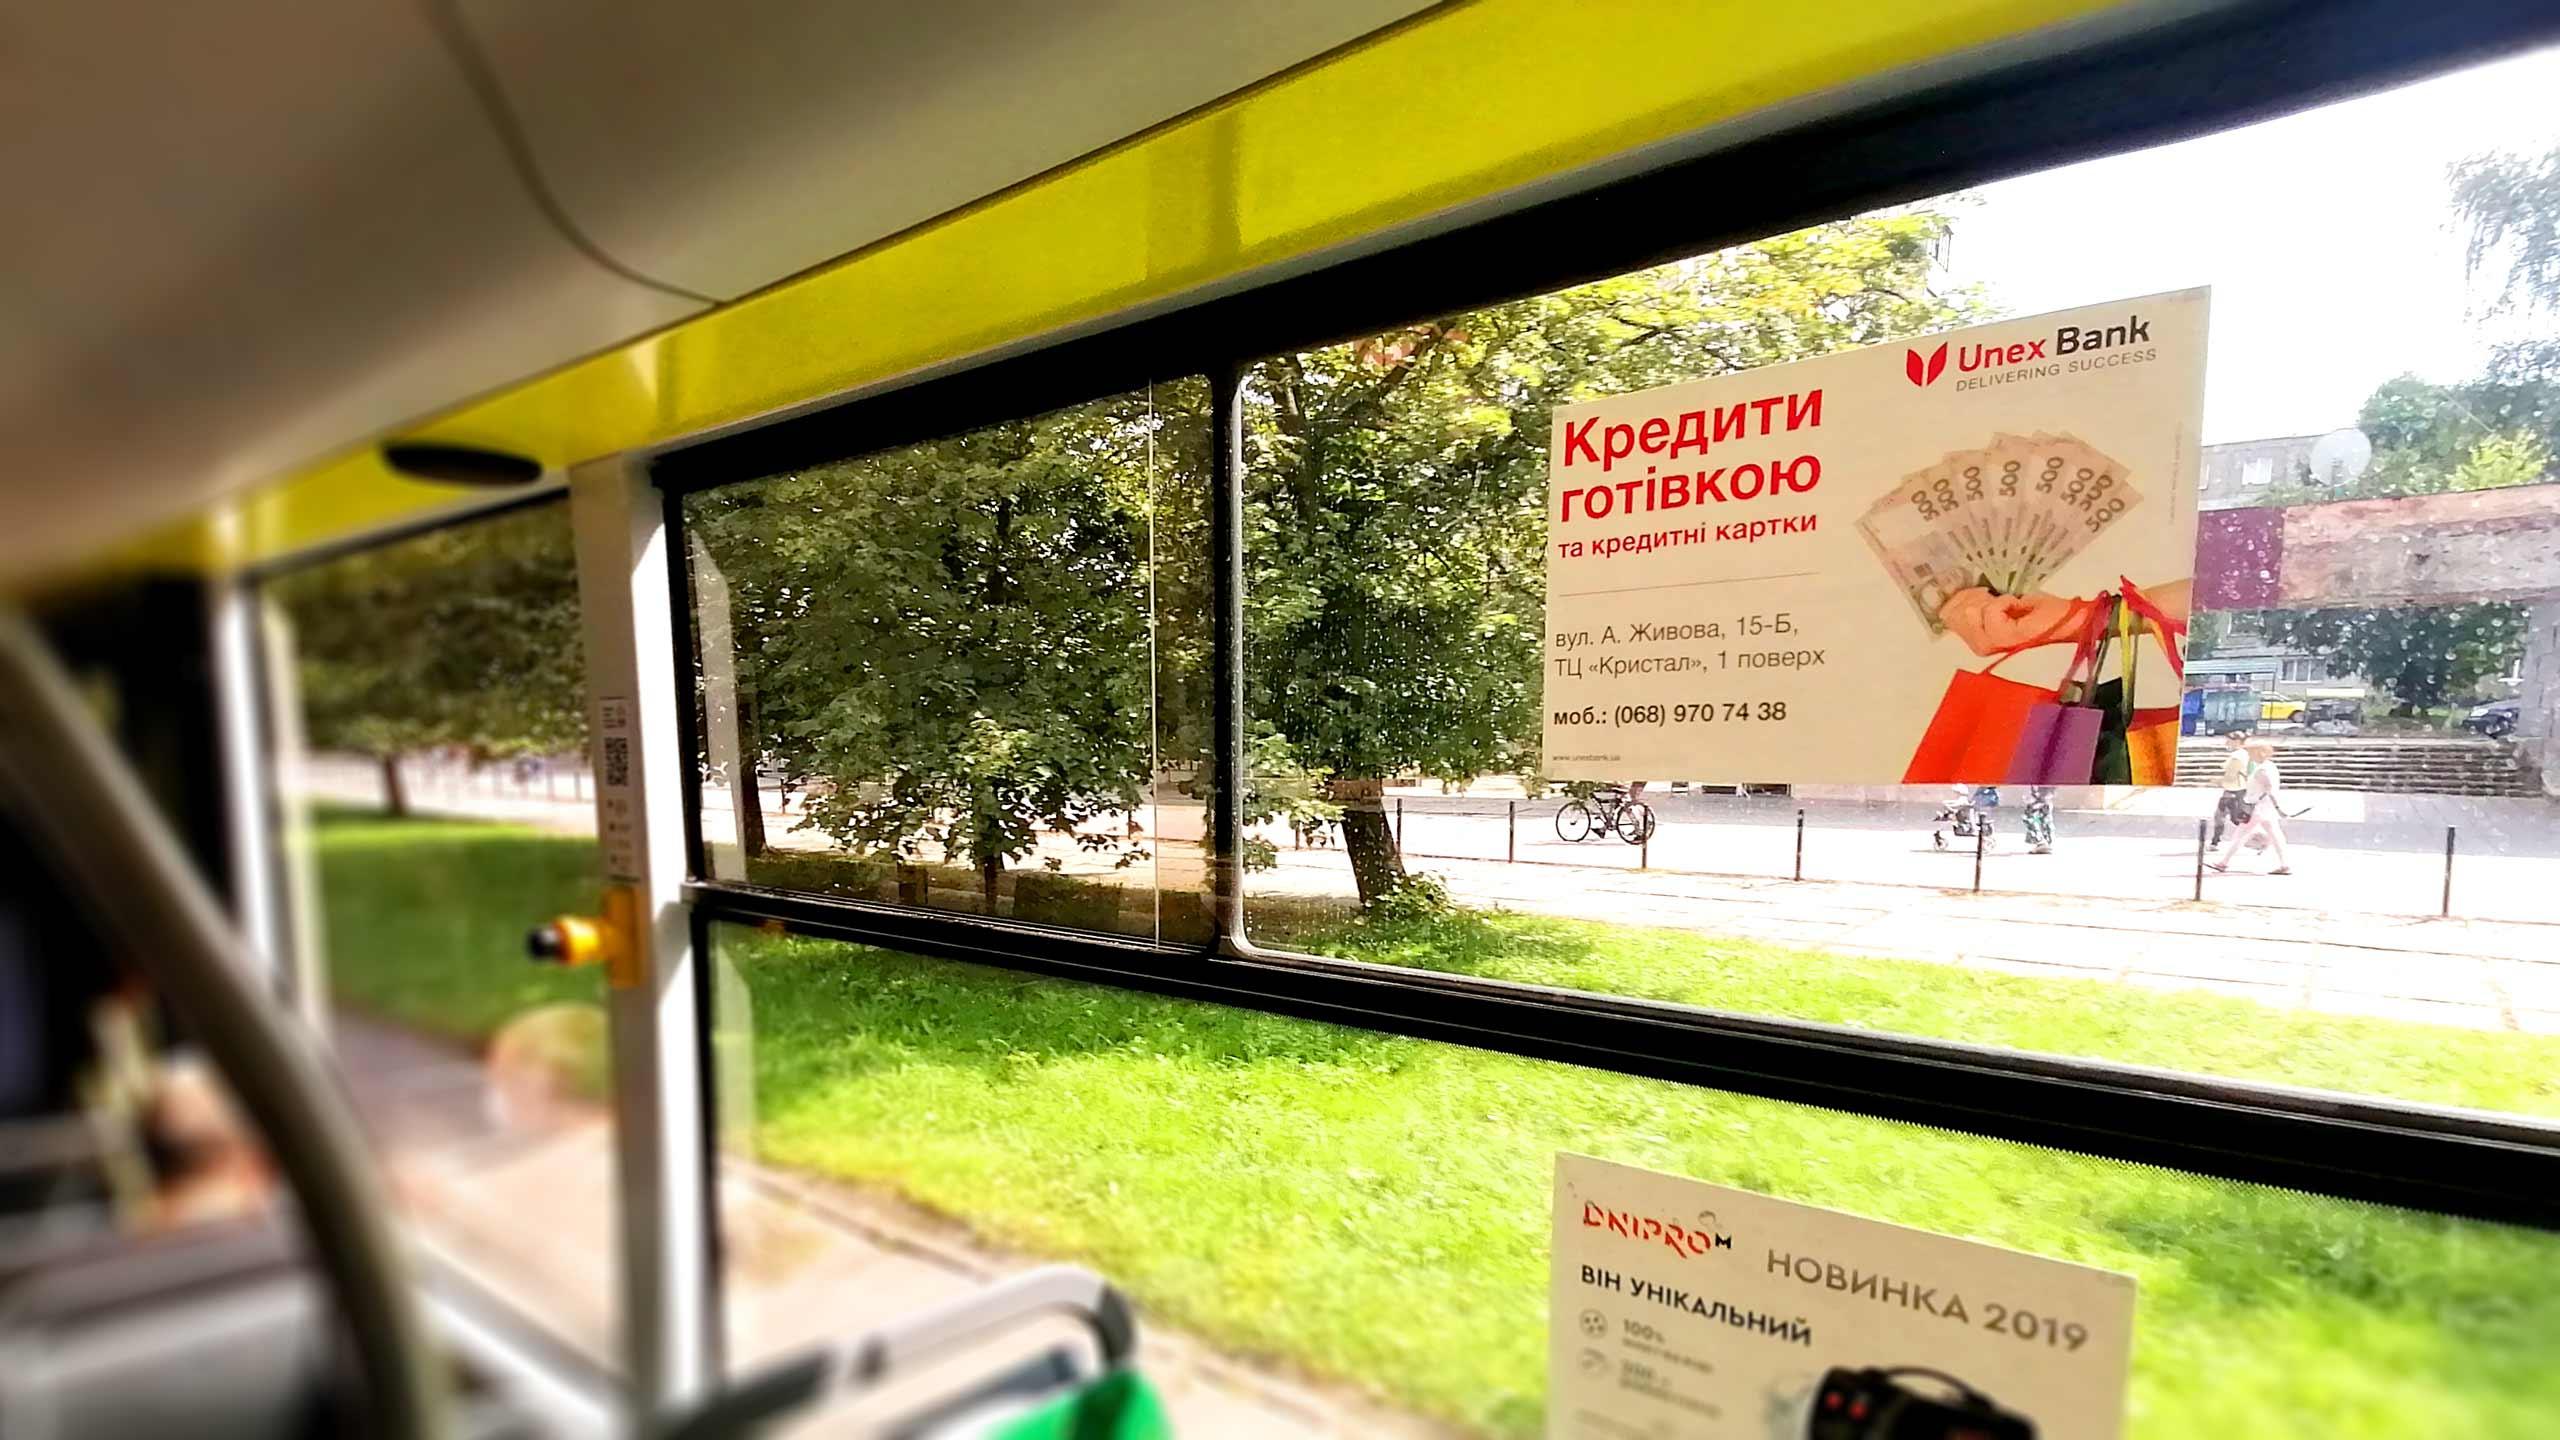 Реклама в троллейбусах Днепр